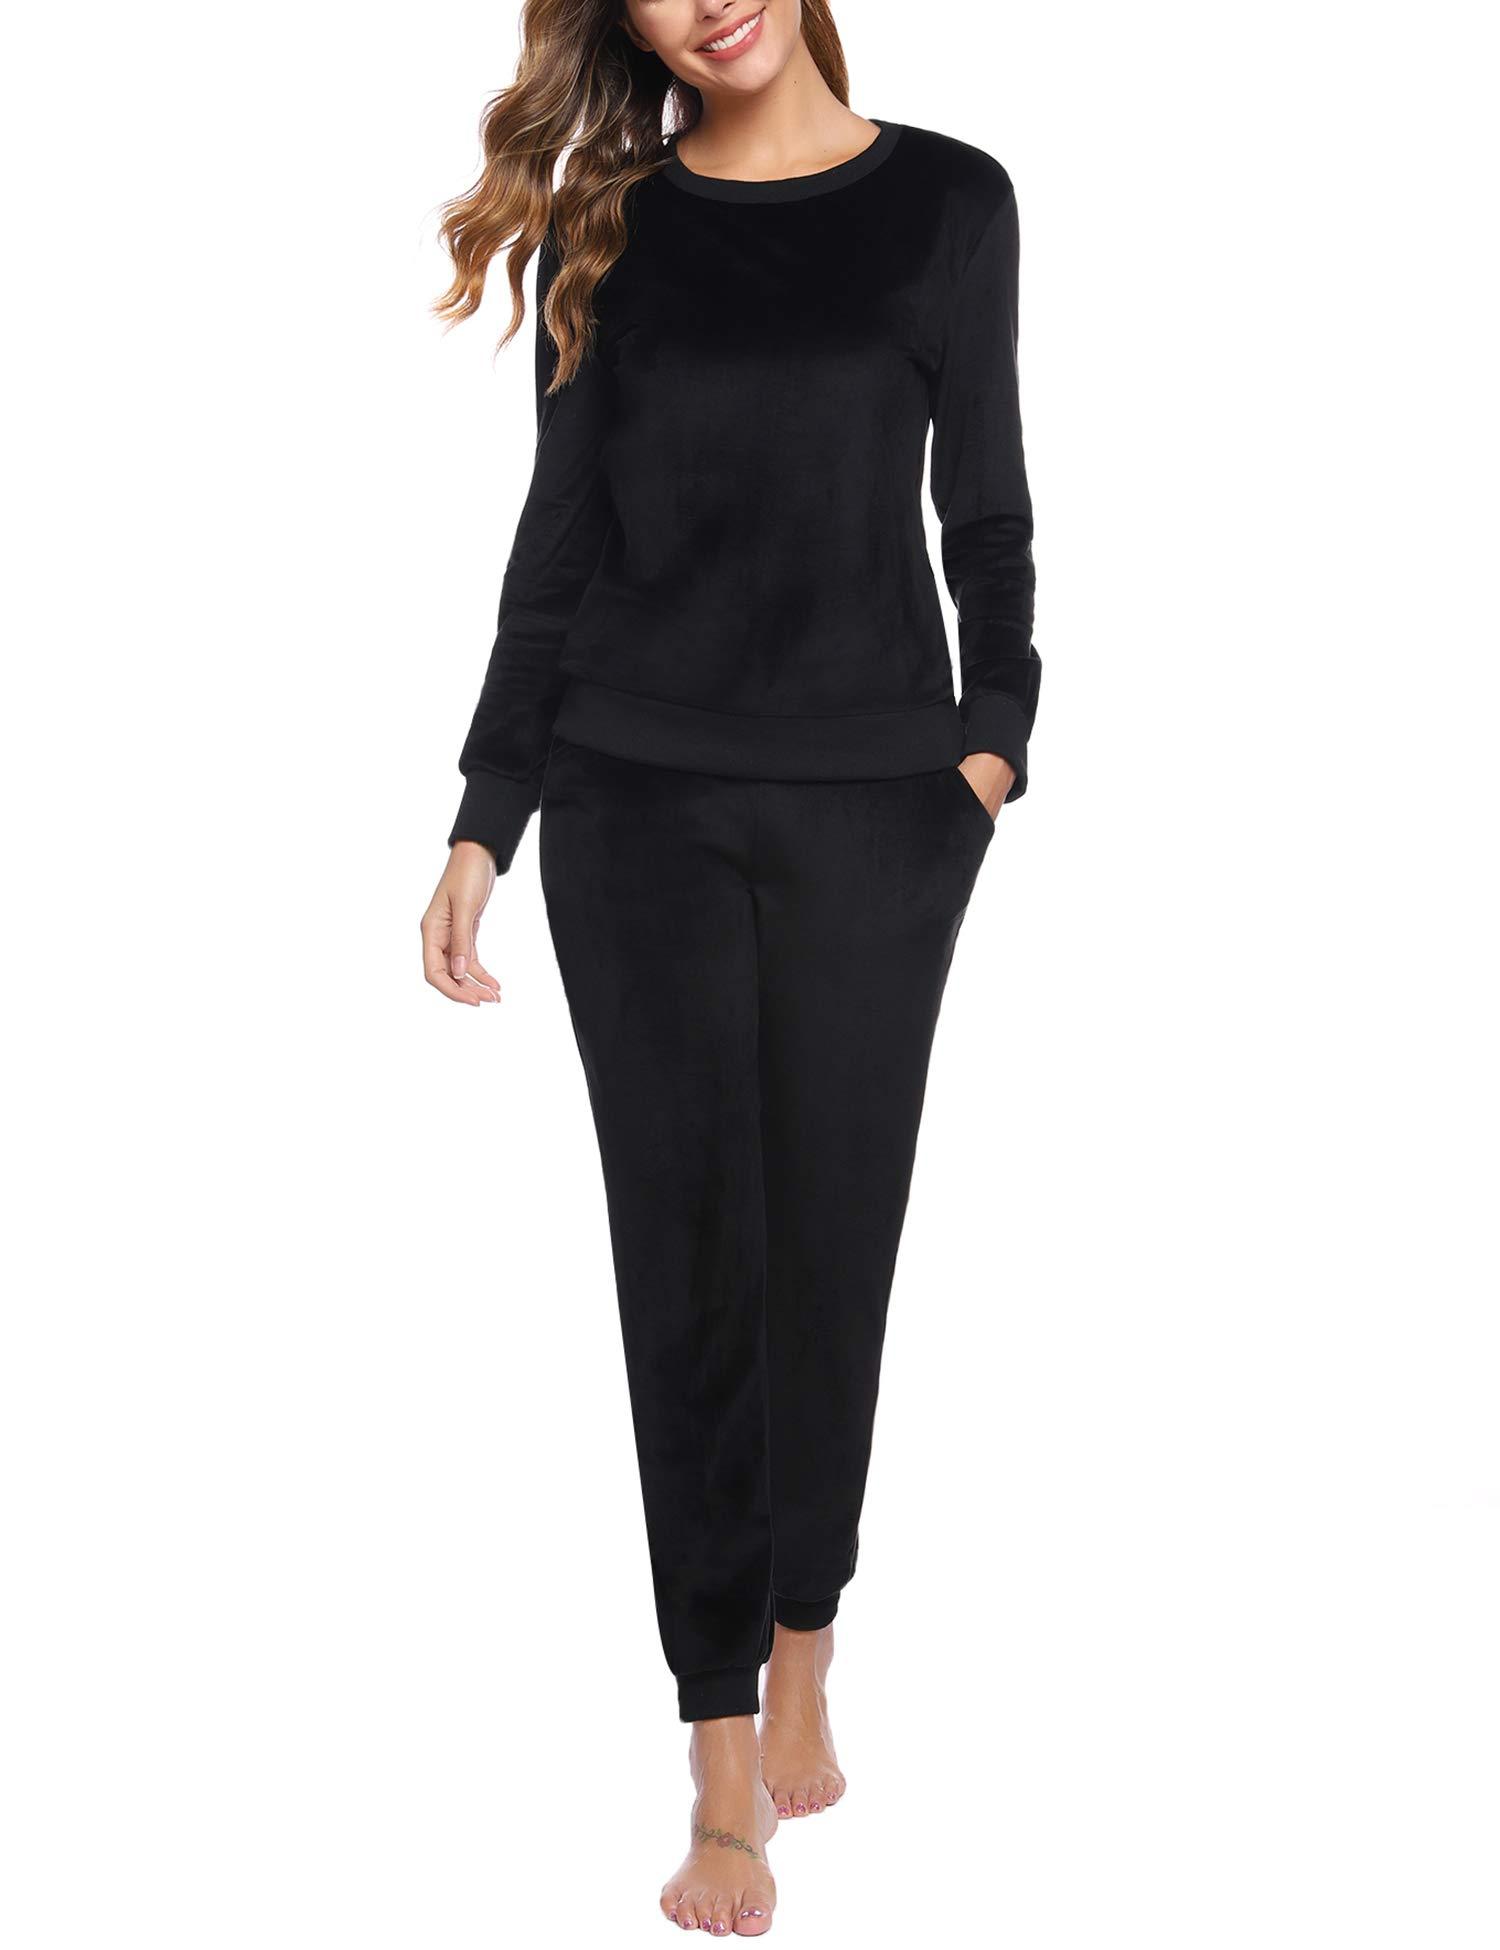 Abollria Women's 2 Piece Outfits - Sweatsuits Long Sleeve Pullover Sweatshirt Long Pants Tracksuit Set Black by Abollria